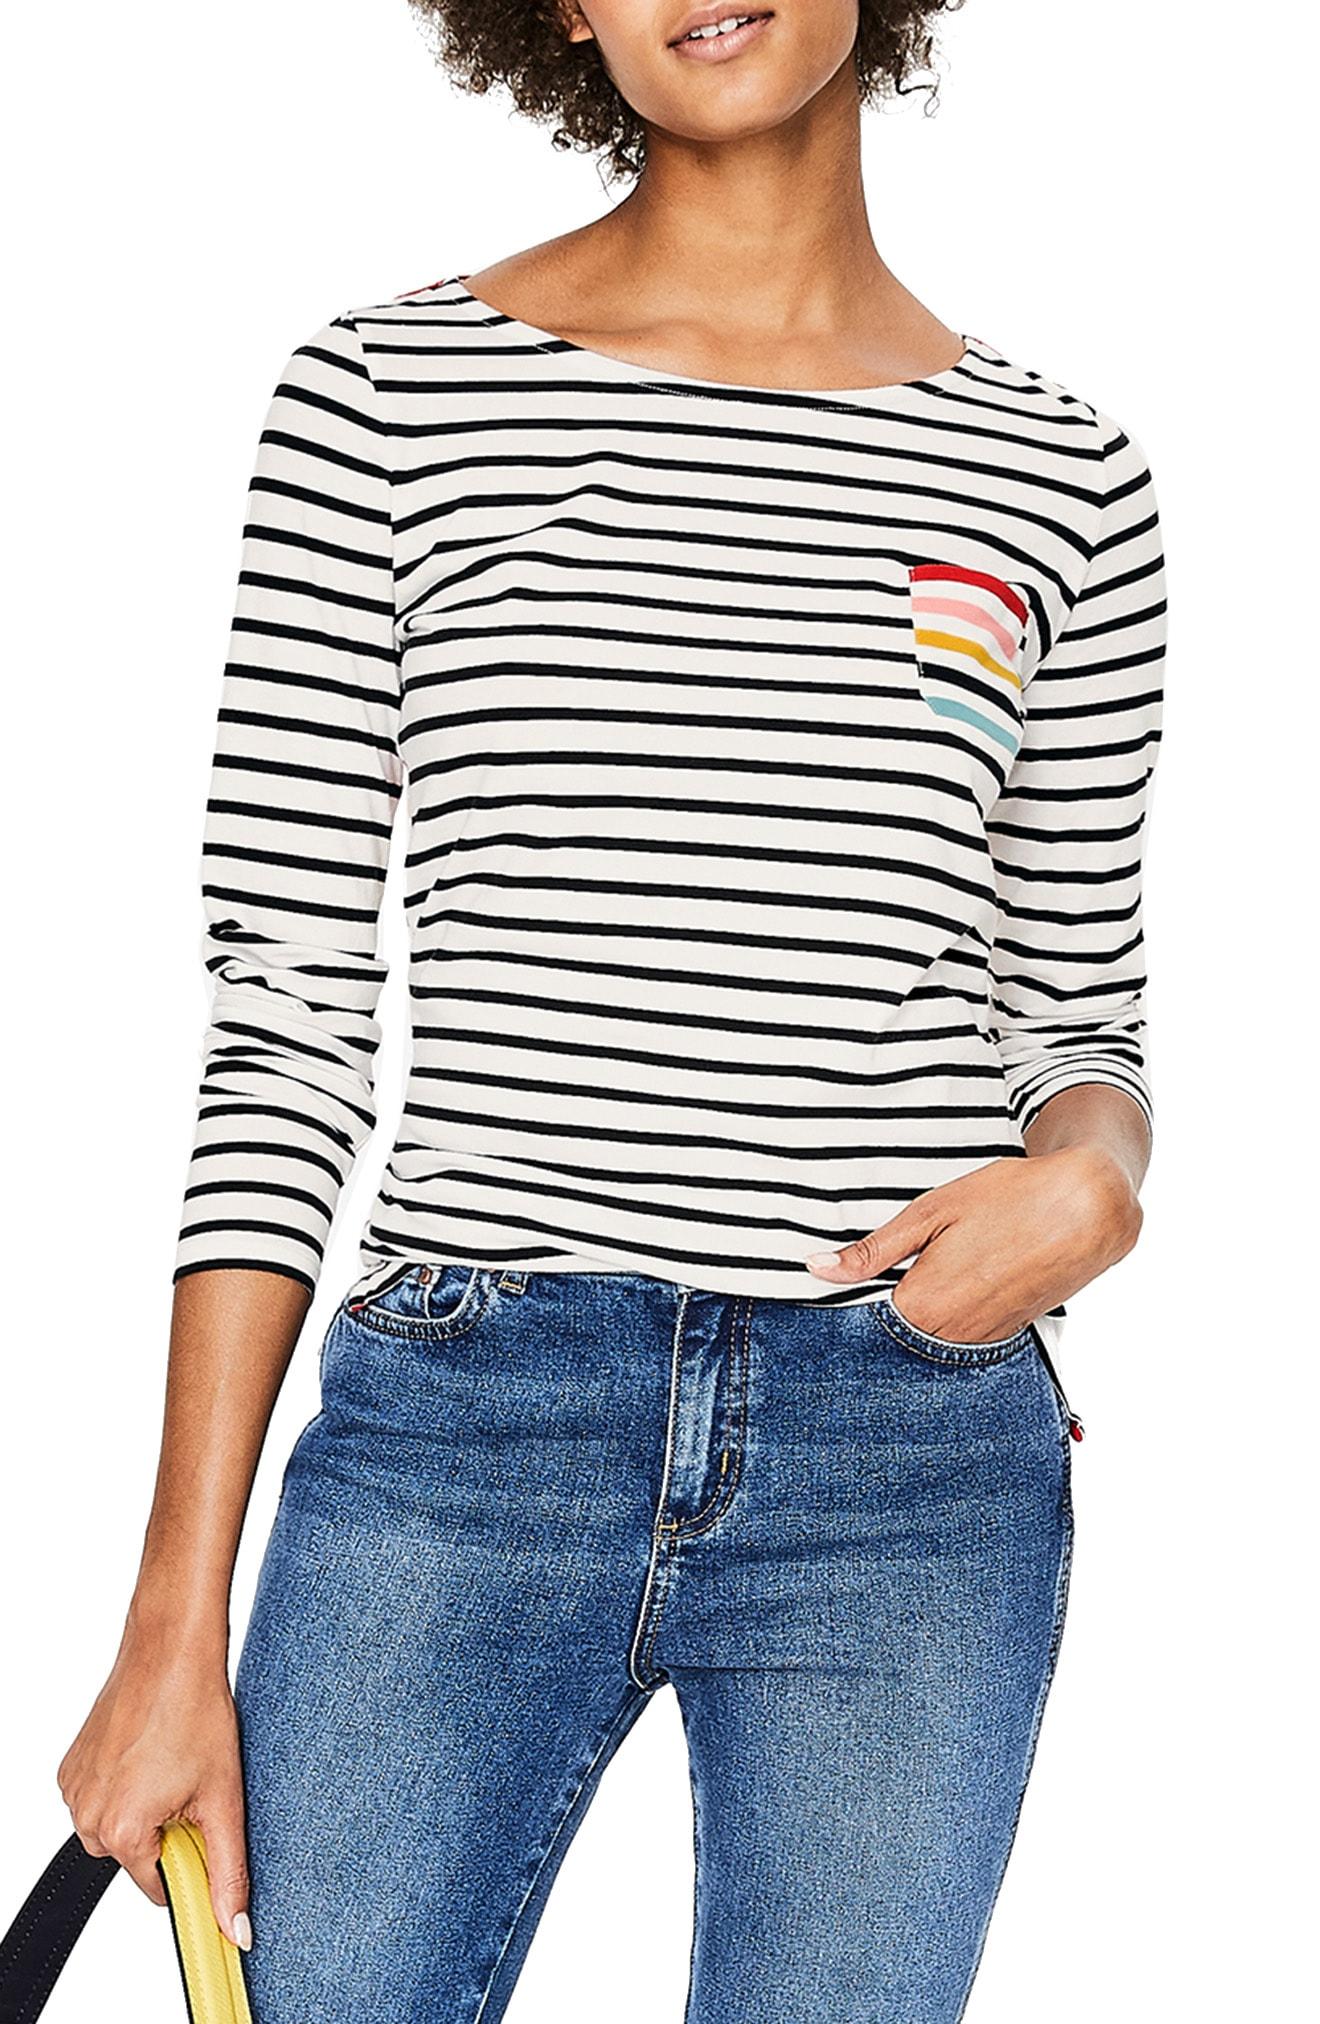 Boden Breton Stripe Colorblock Top